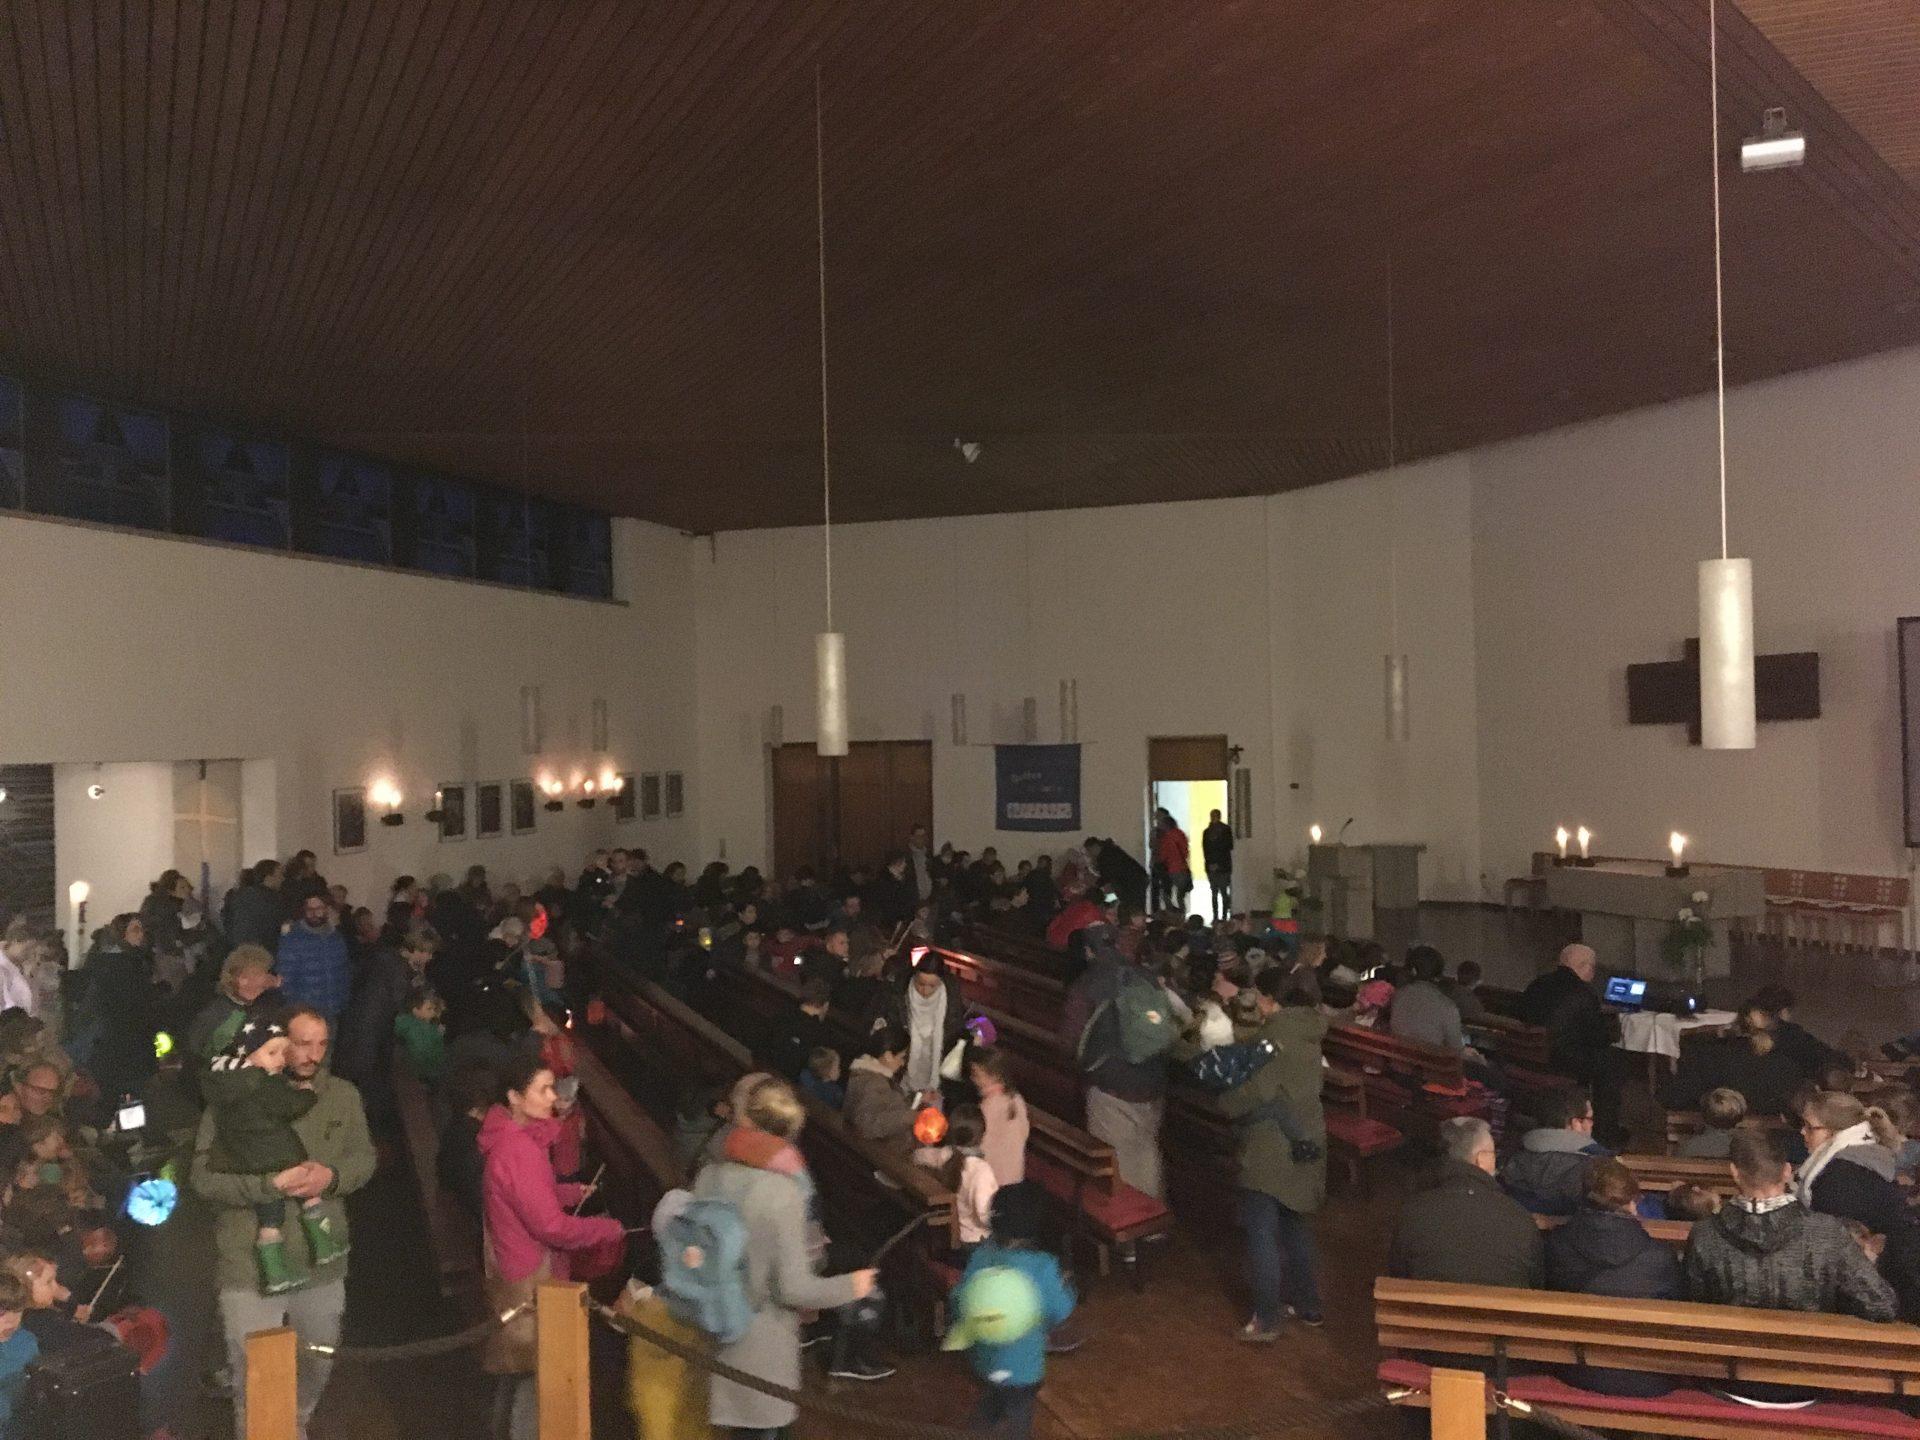 Nach dem Martinsritt ging es in die Thomas Morus Kirche